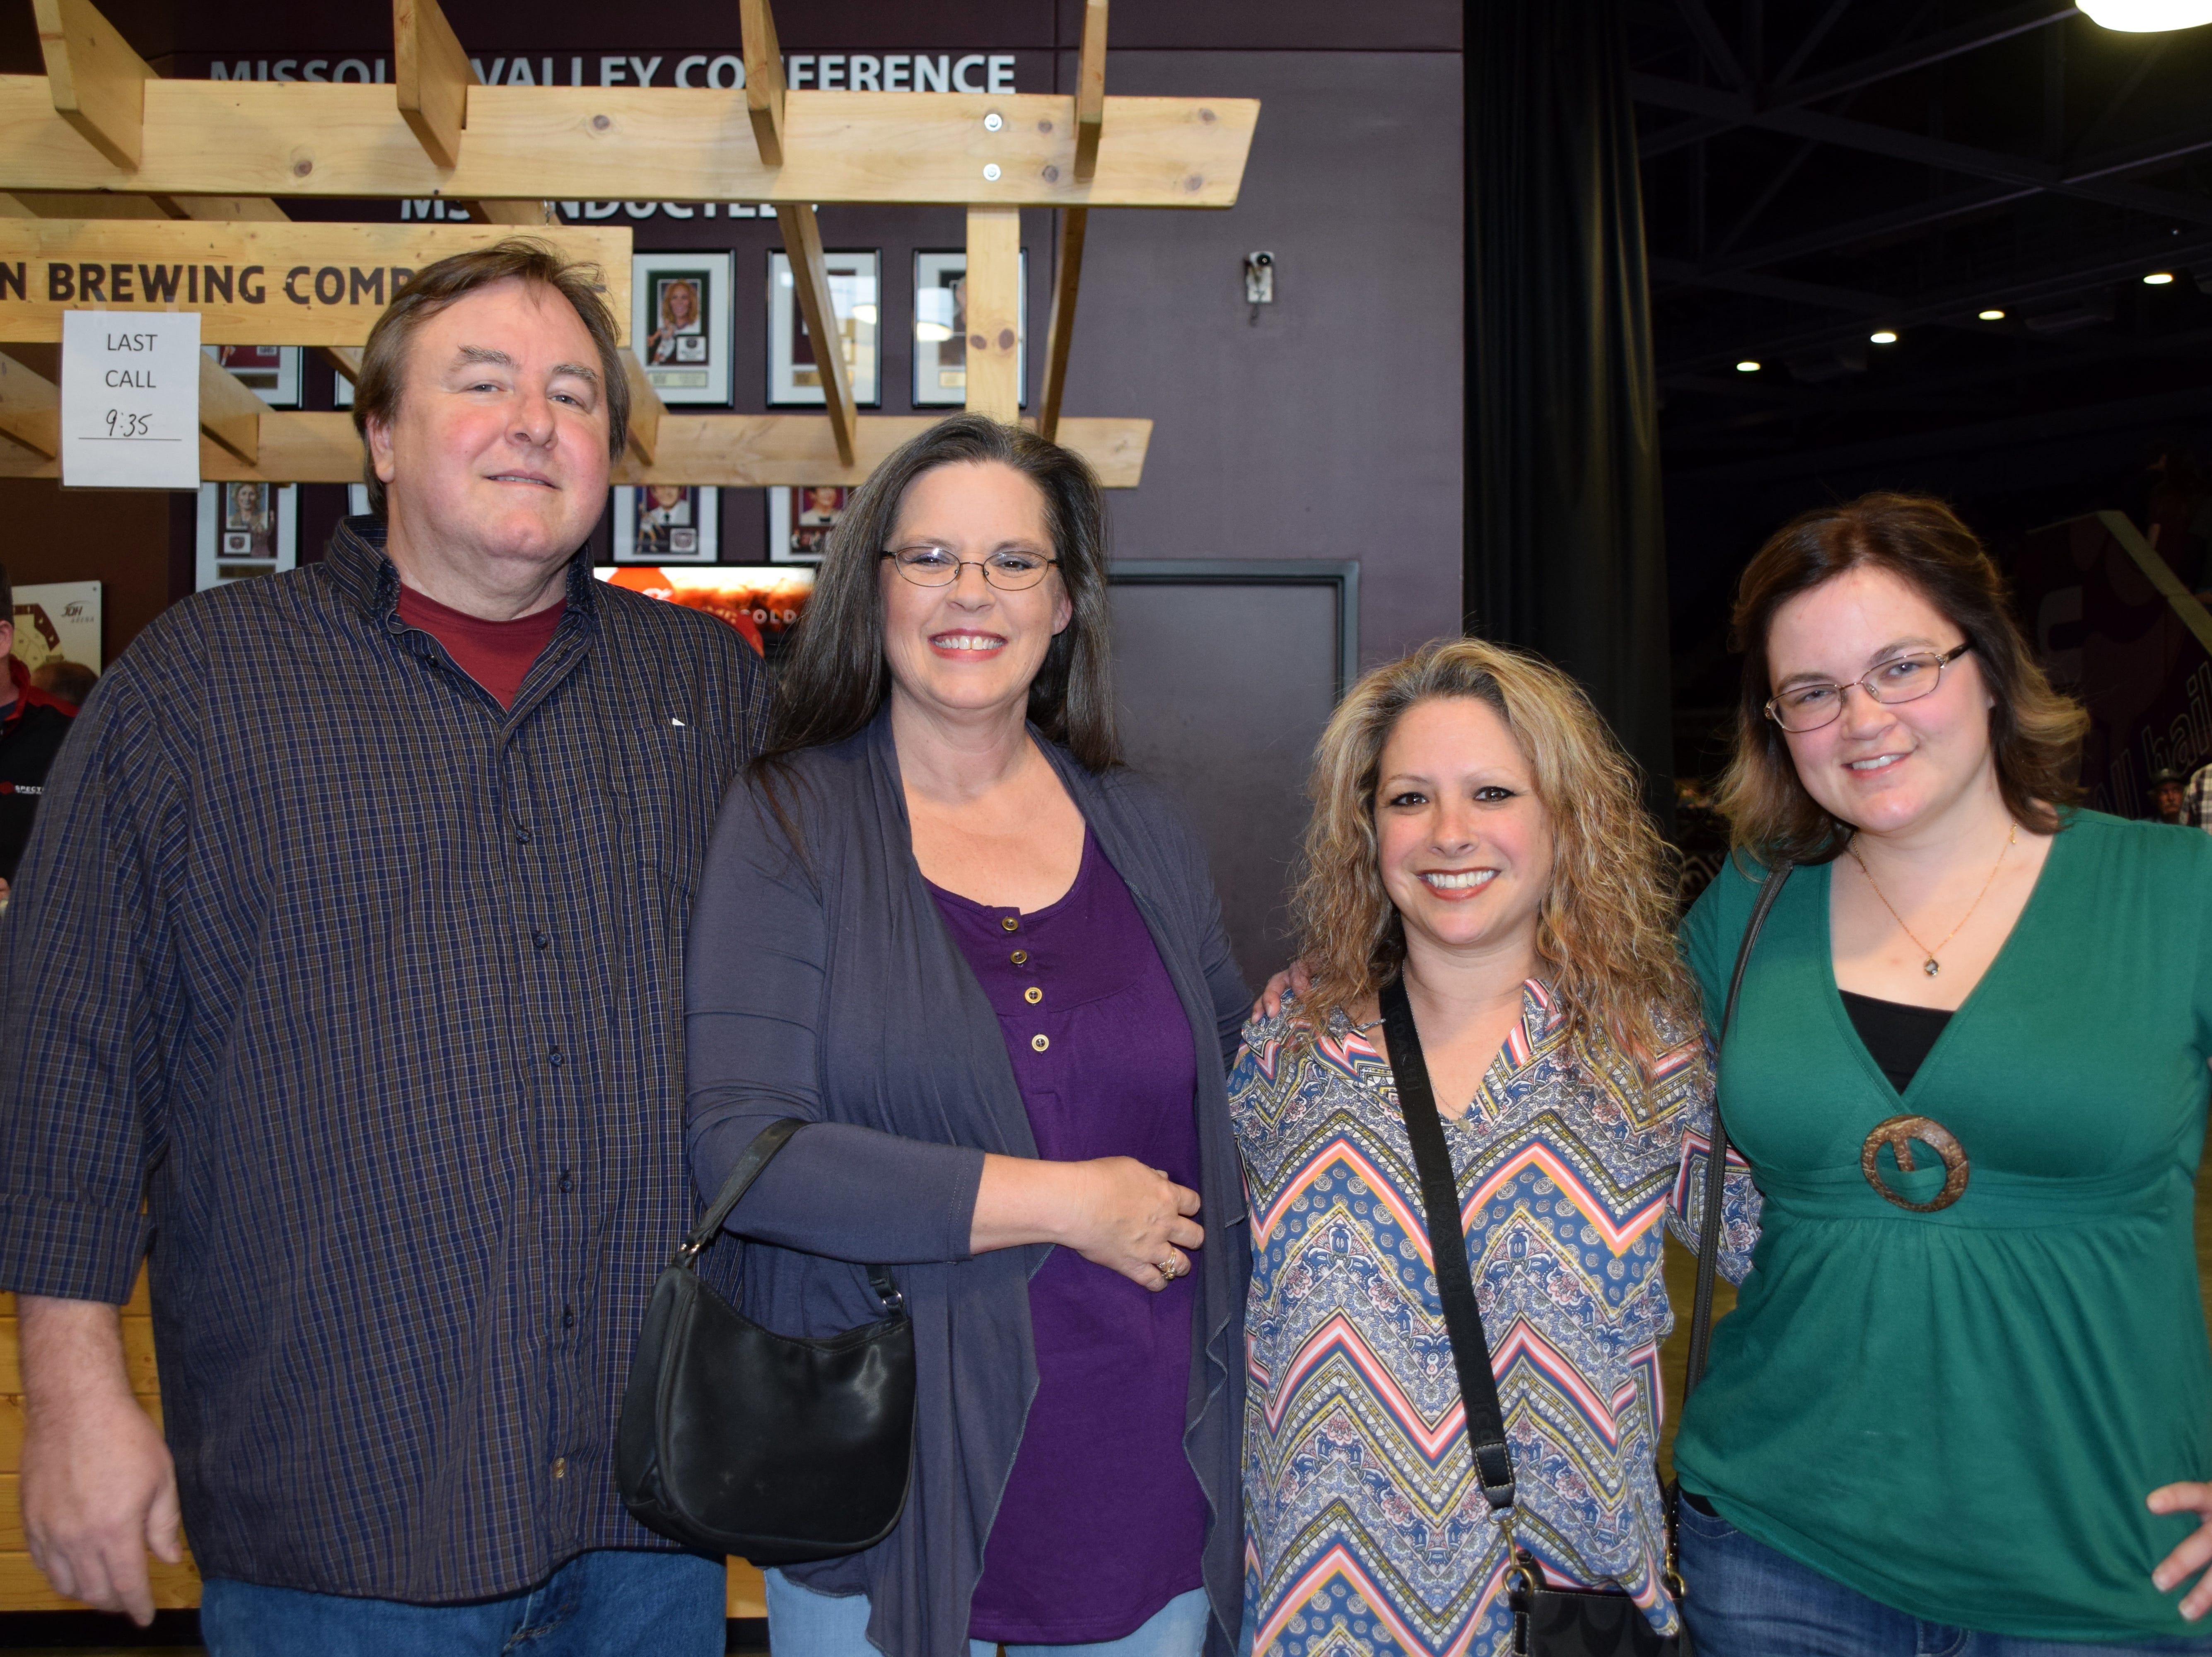 Richard and Regina Johnson, Angela Smith and Bridget Zacharias